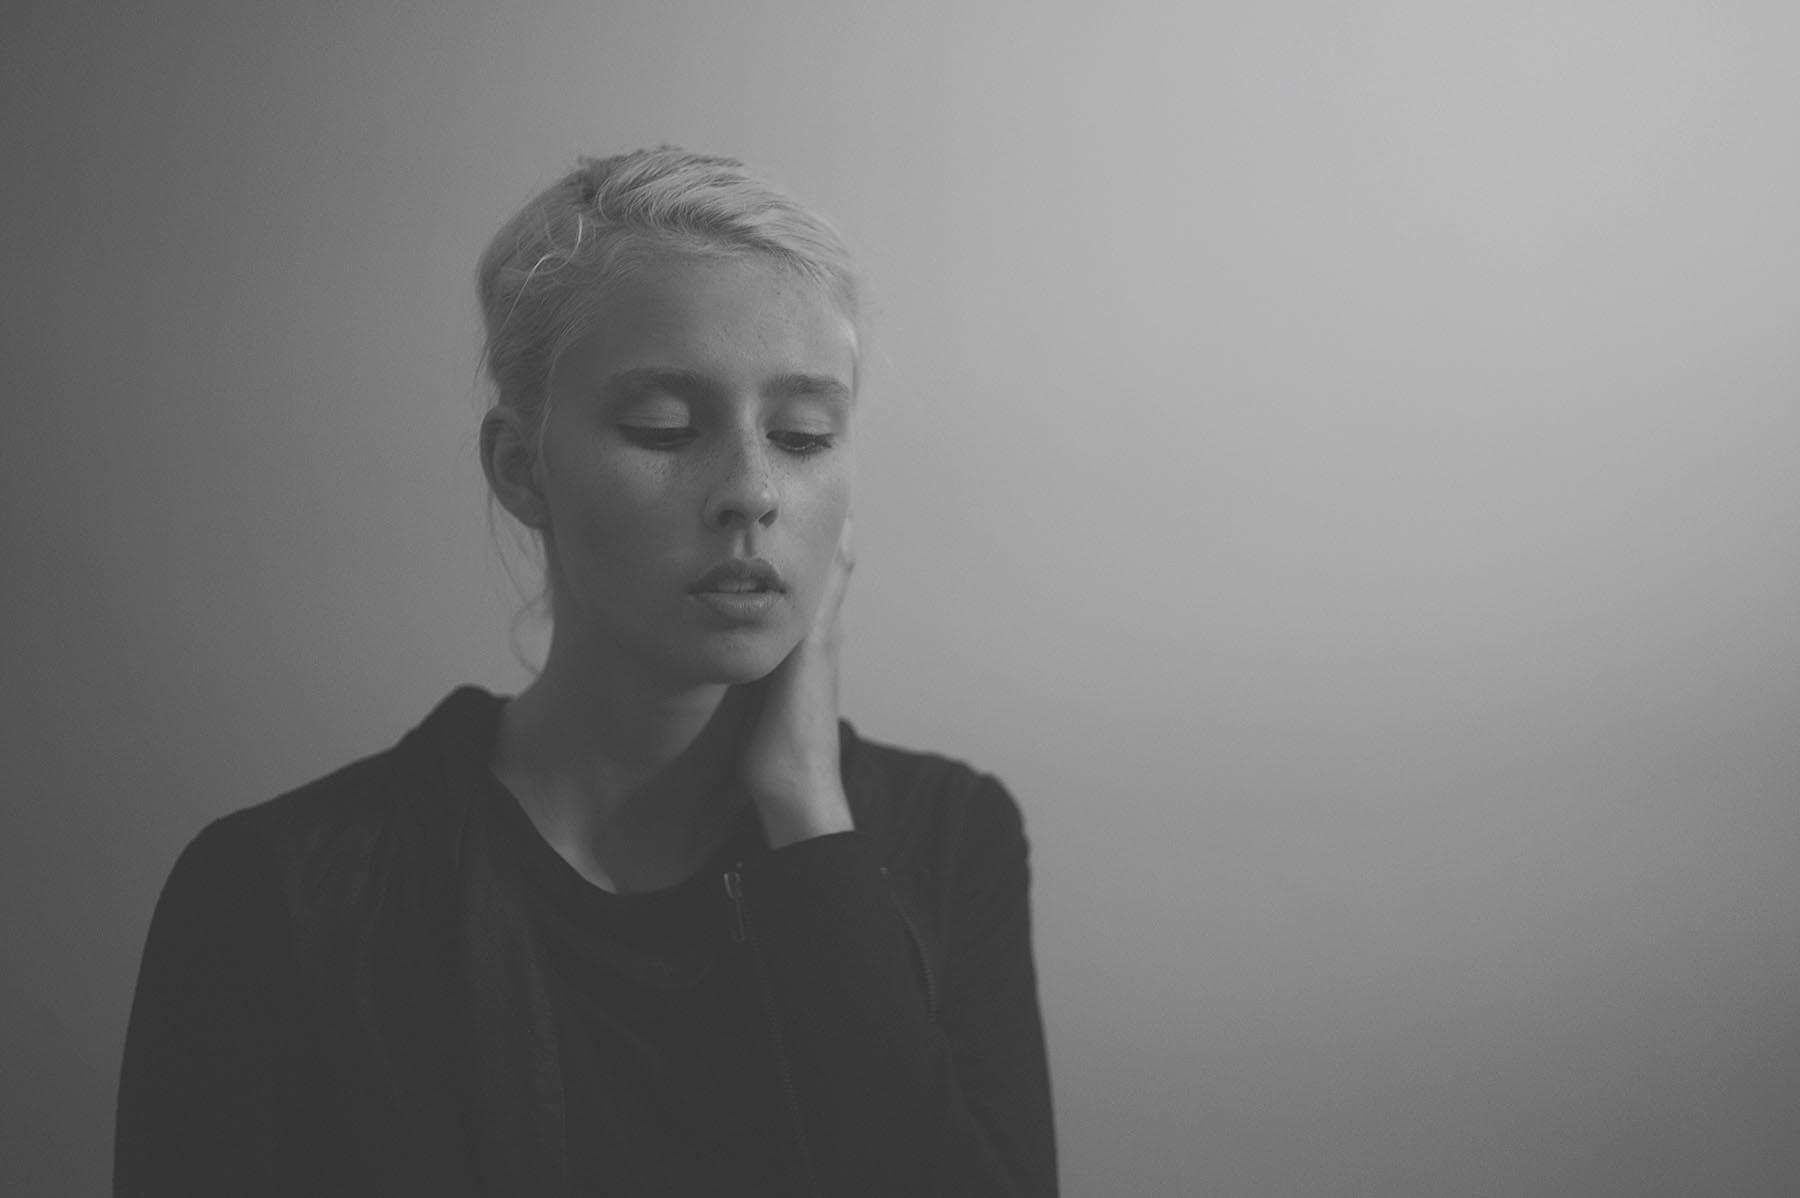 Noel McLaughlin Portrait